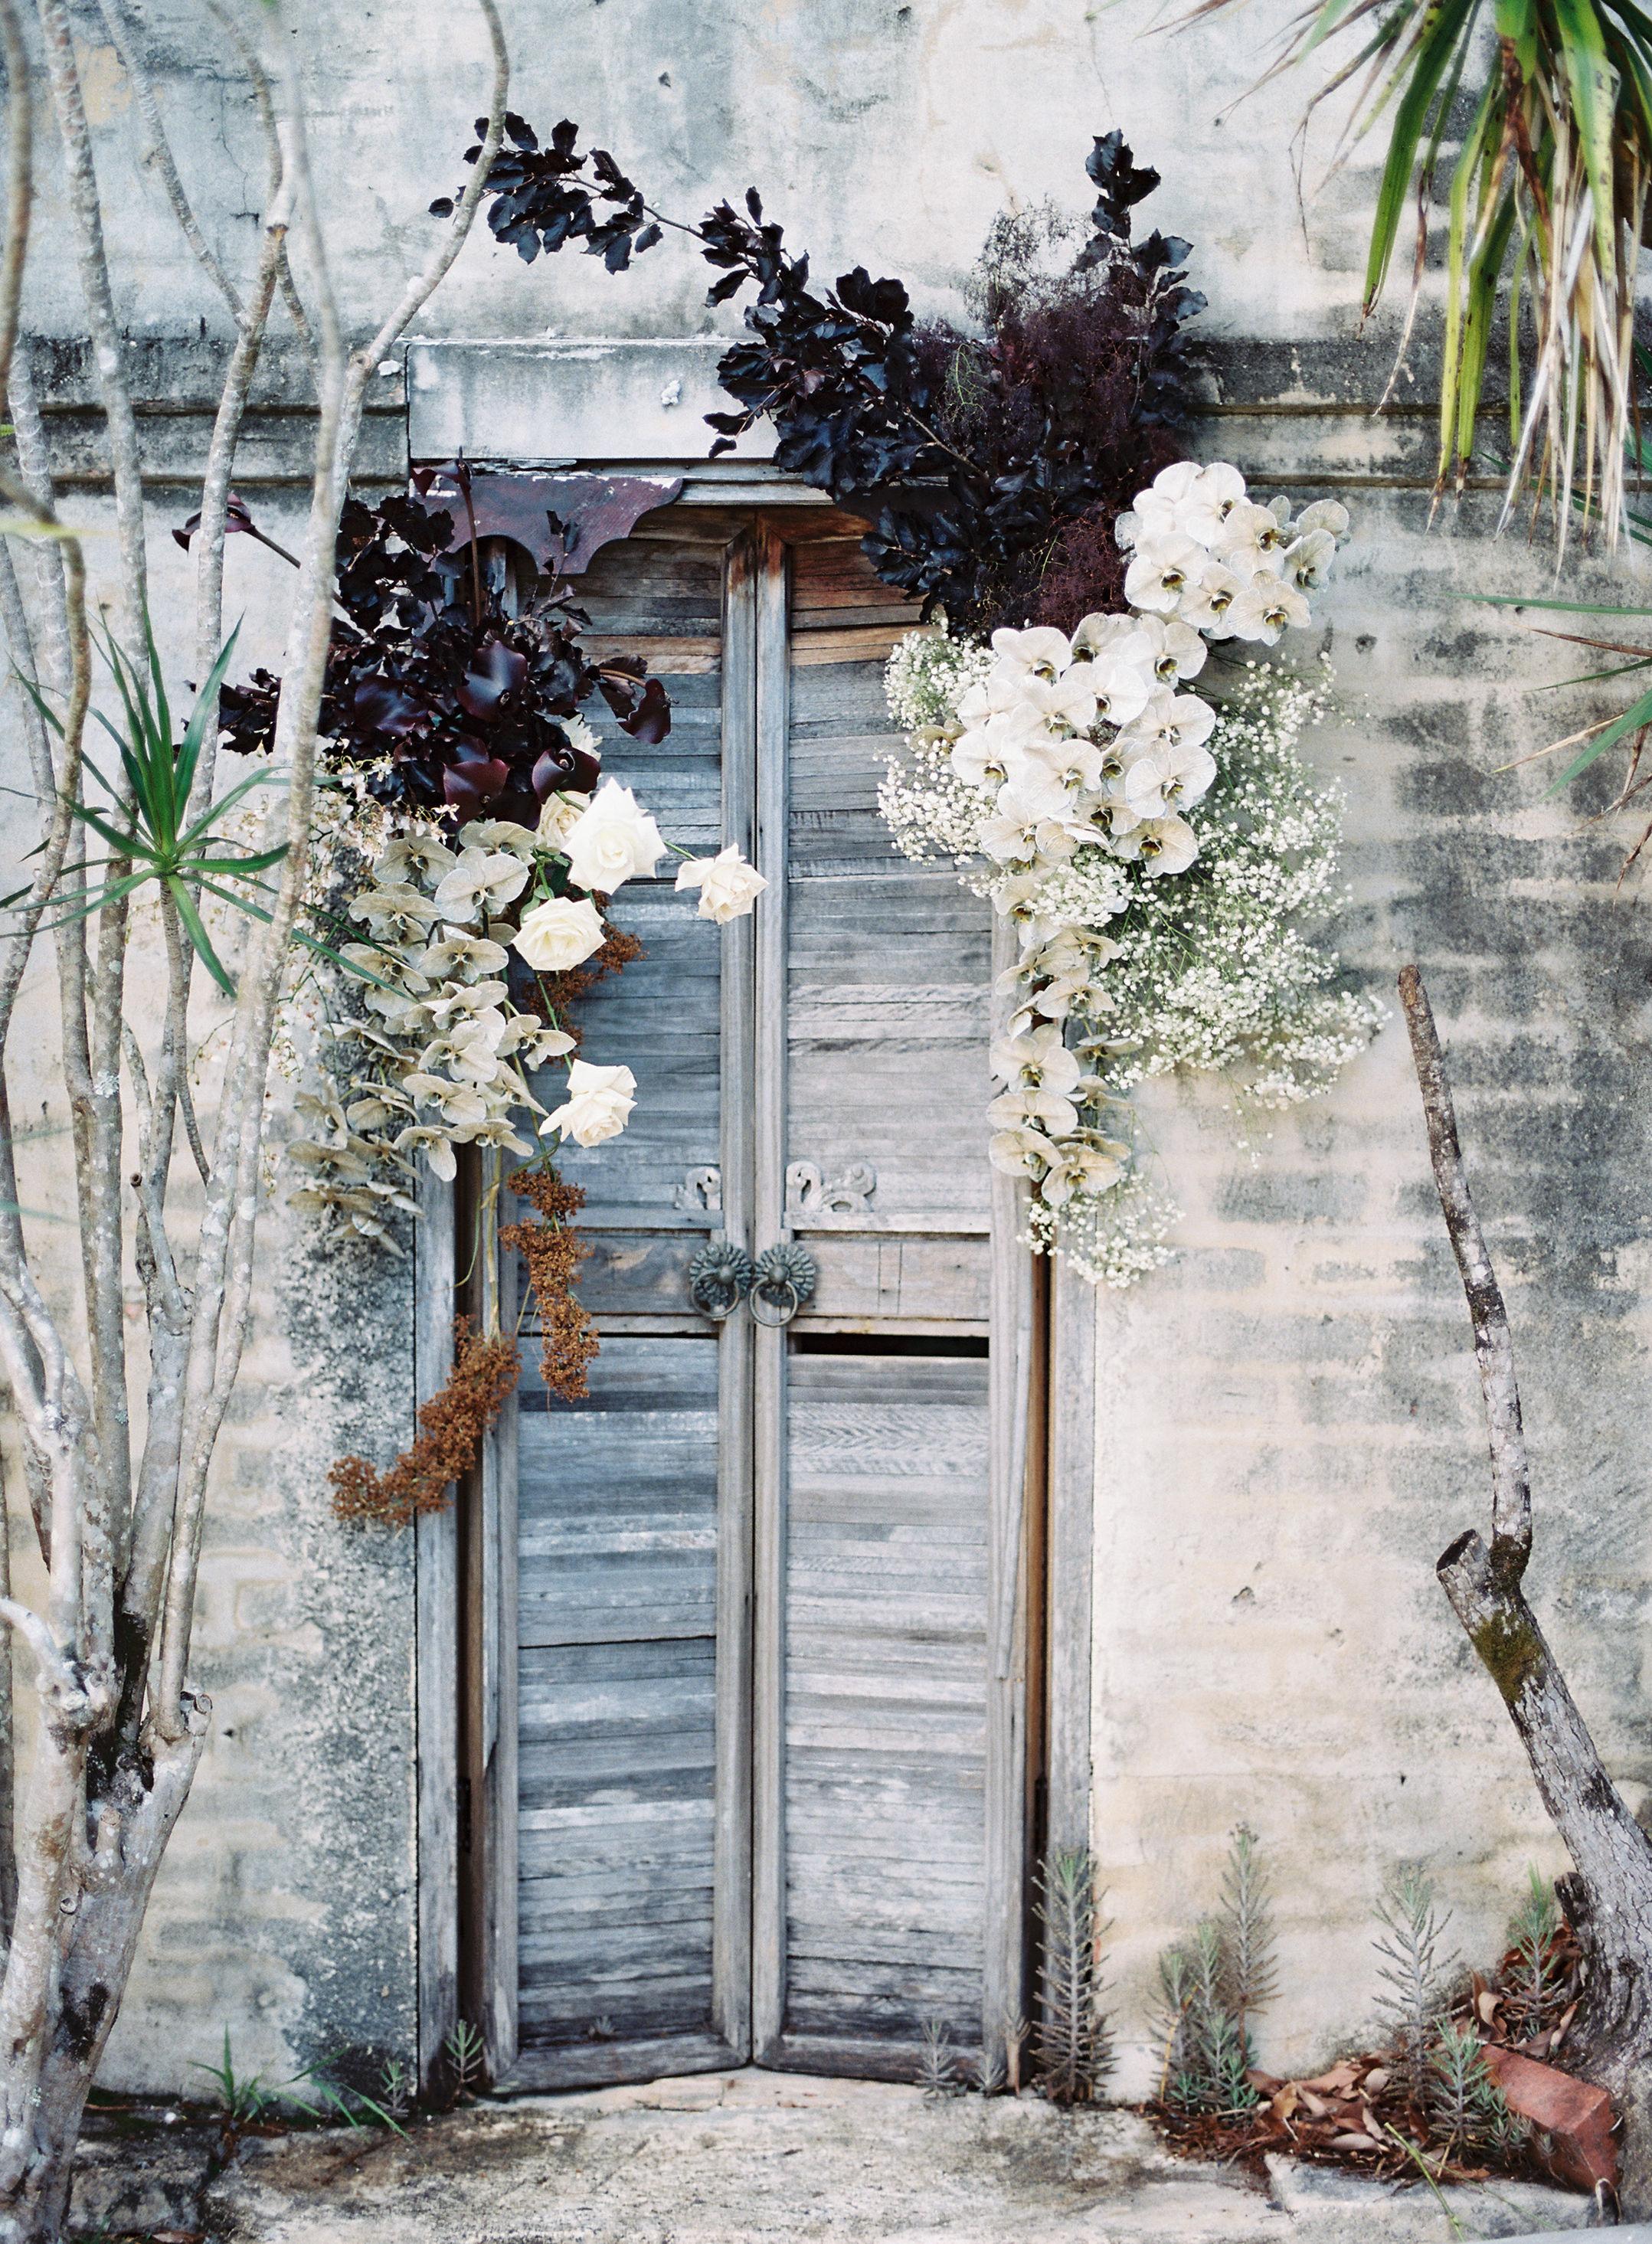 Villa Rustica | Bloodwood Botanica Spring Blossom arbour